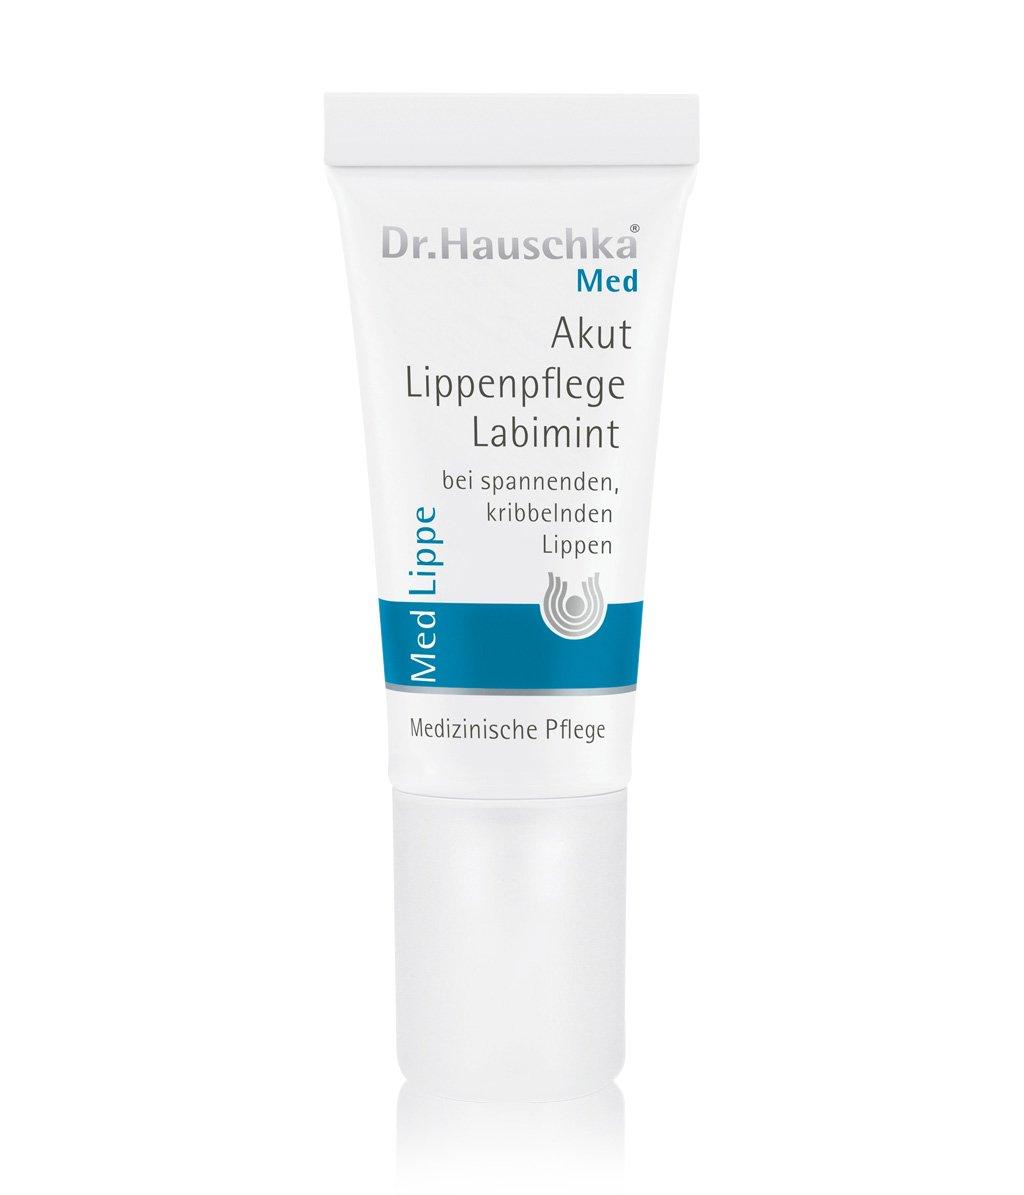 Dr. Hauschka Akut Labimint Lippenbalsam bestellen | FLACONI